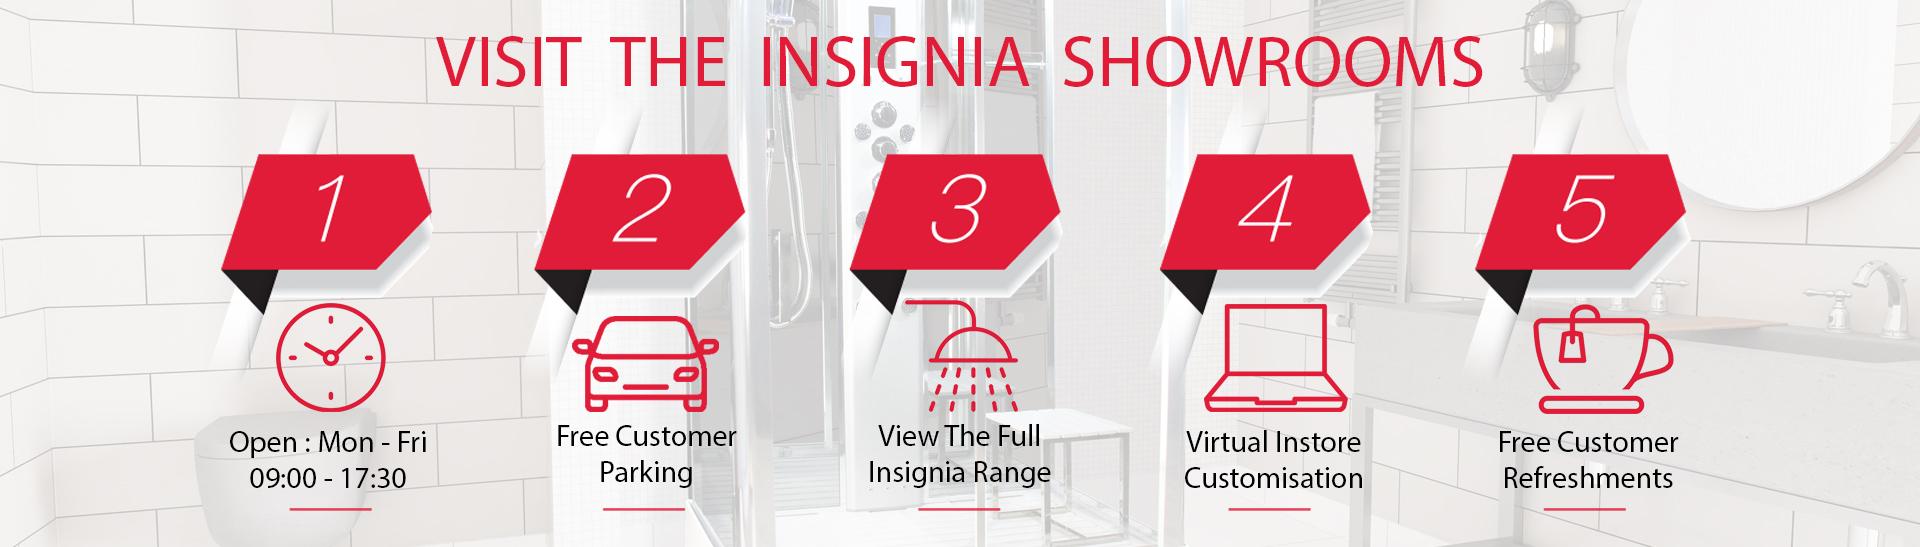 Insignia Showroom